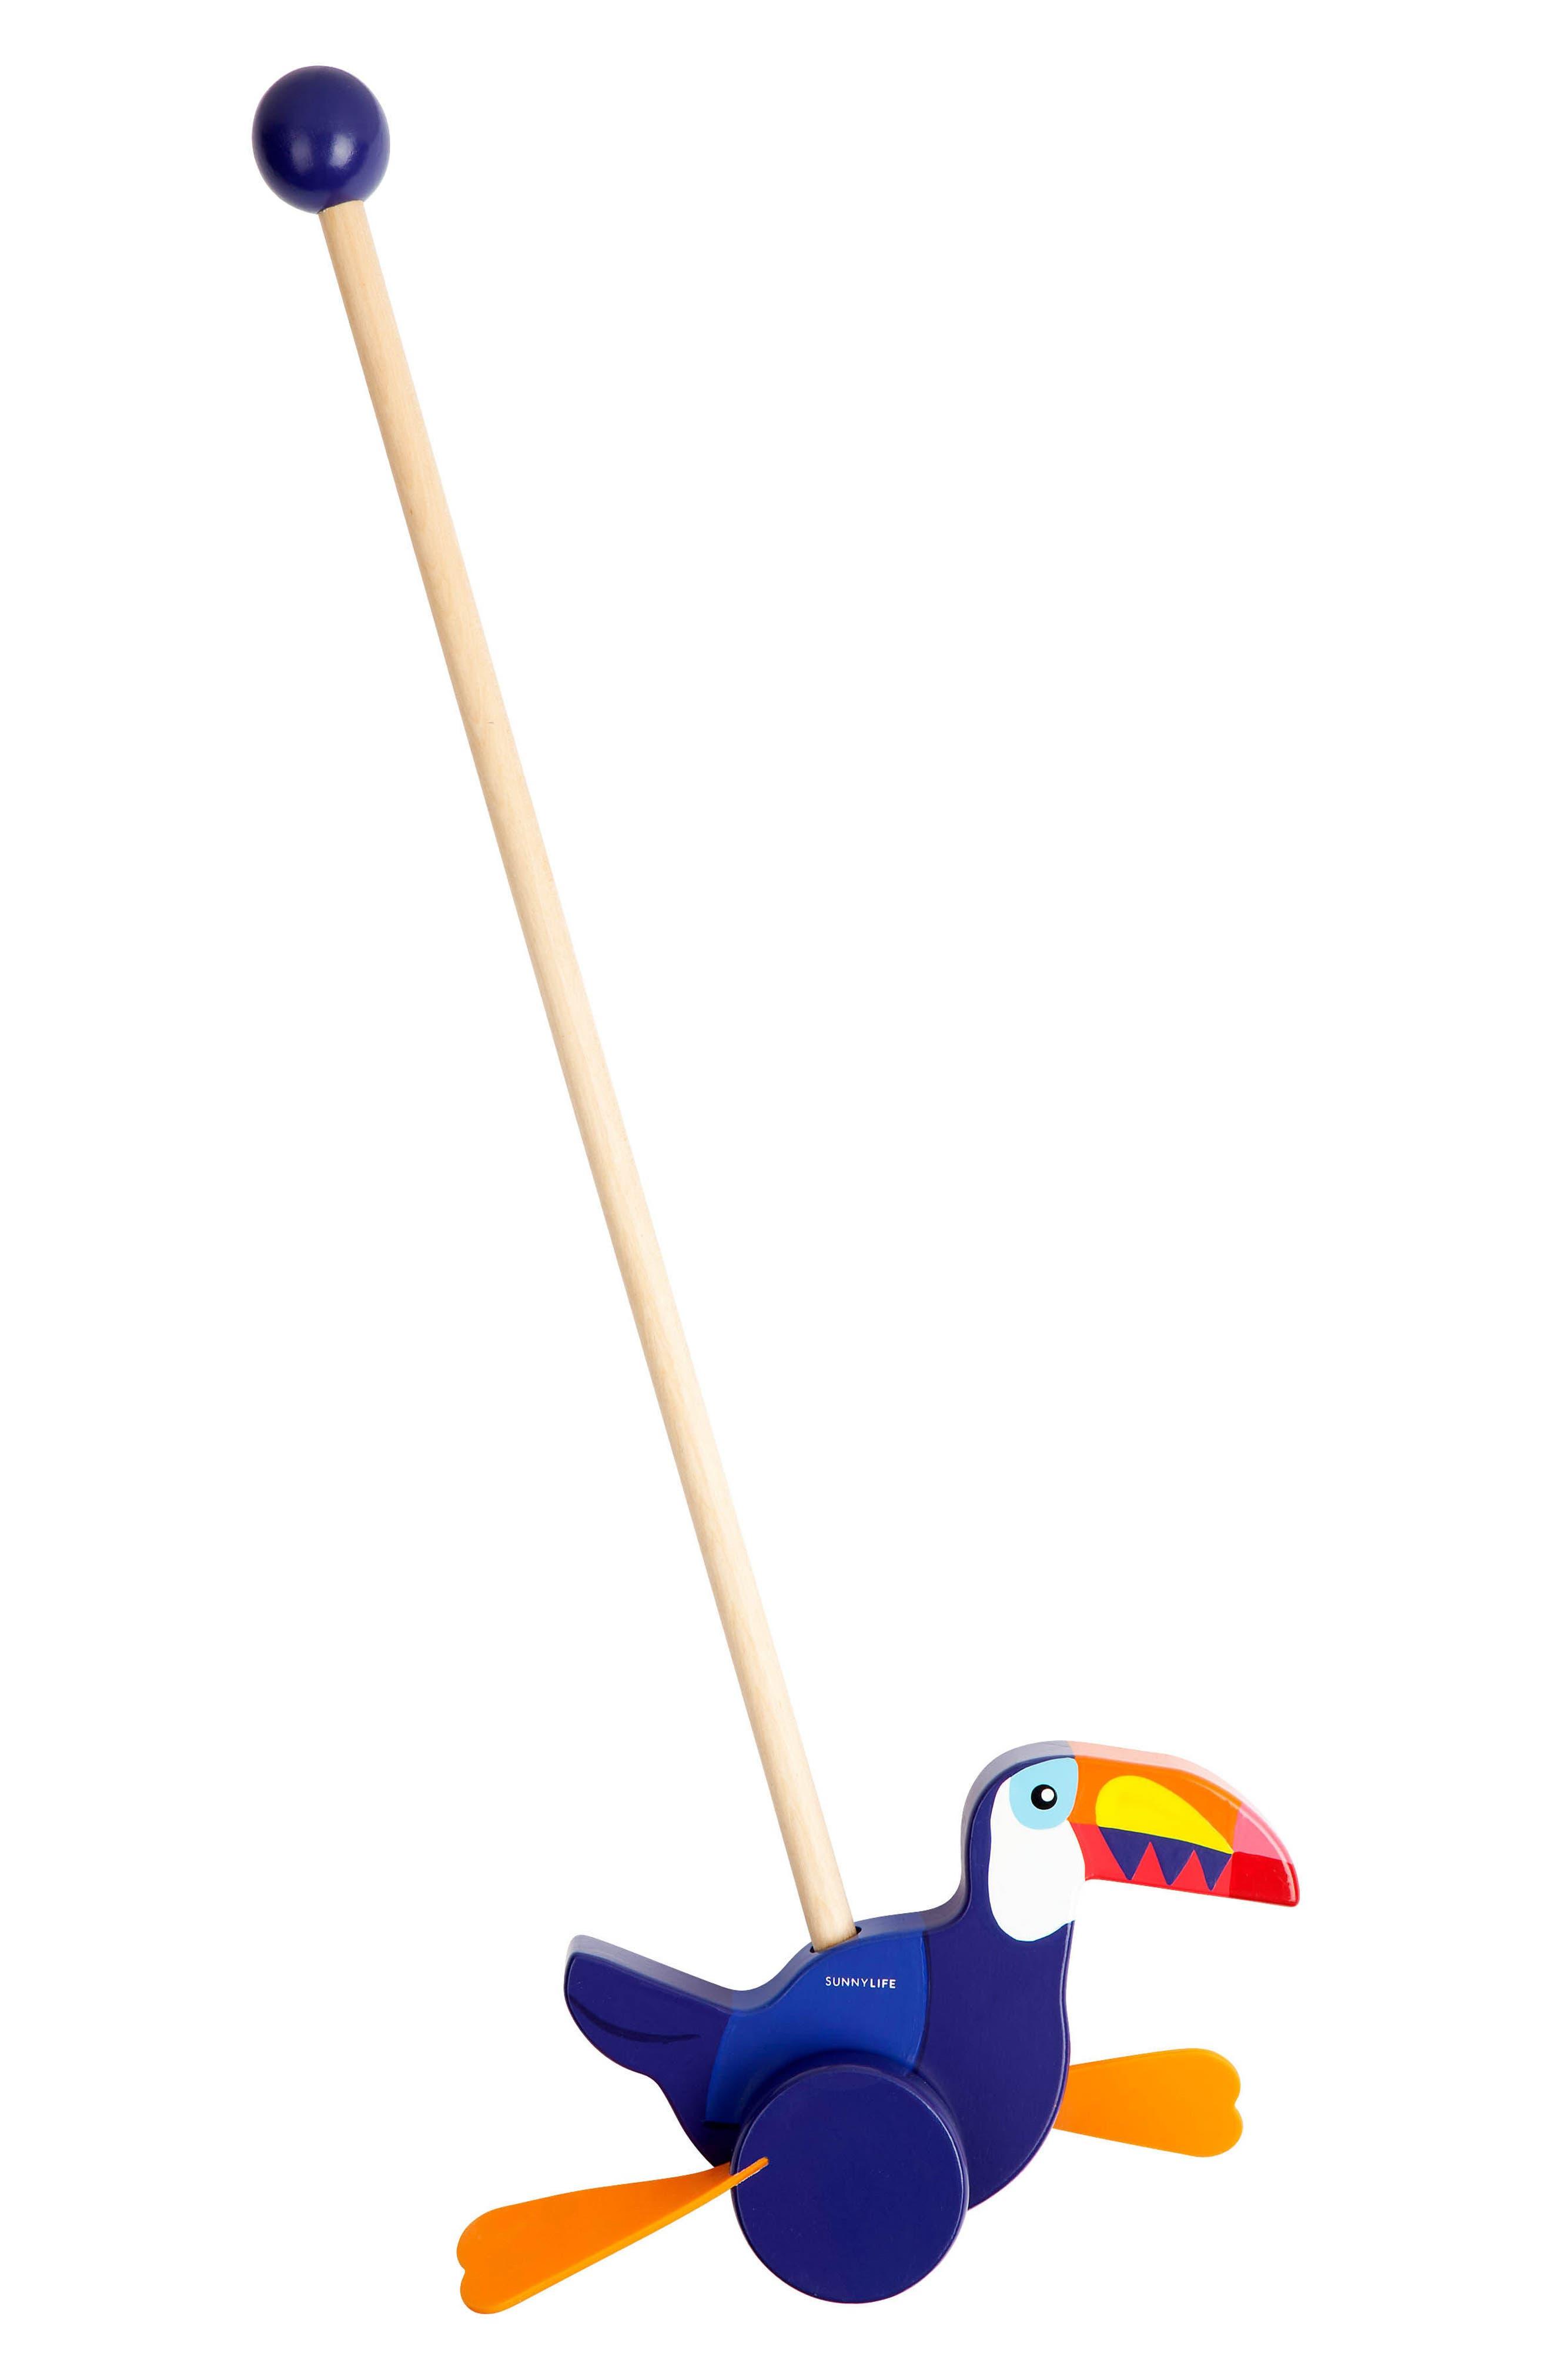 Sunnylife Toucan Push-Along Toy